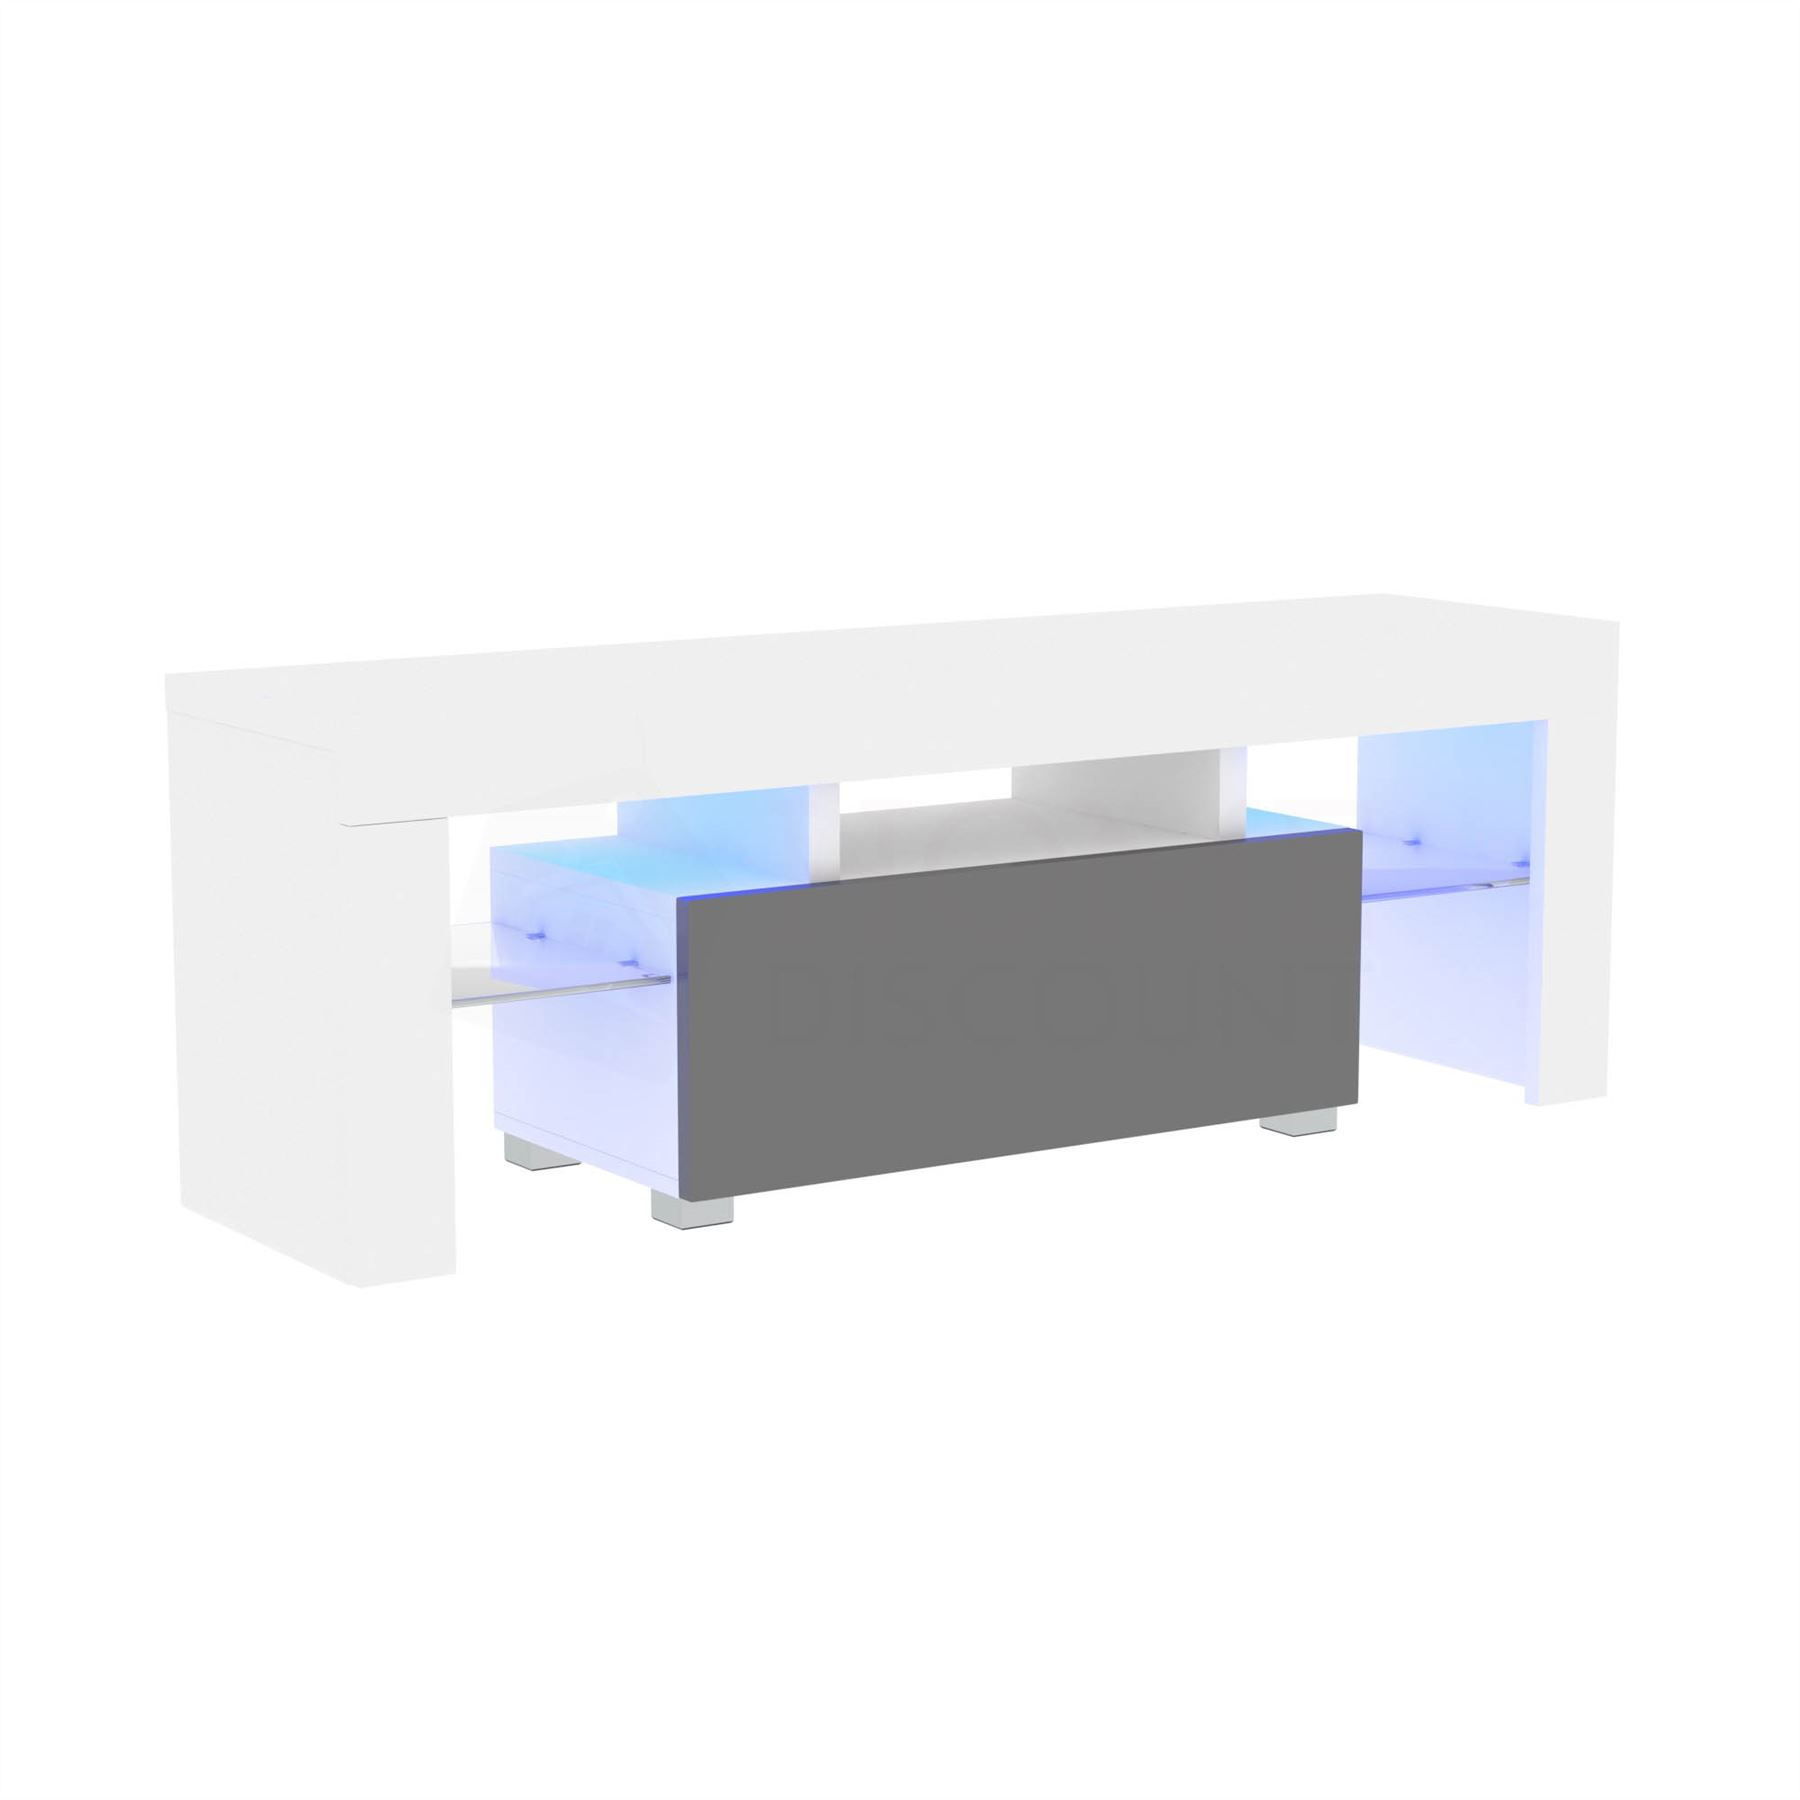 thumbnail 65 - Modern White TV Unit Cabinet Stand Matt body and High Gloss Doors LED Lights